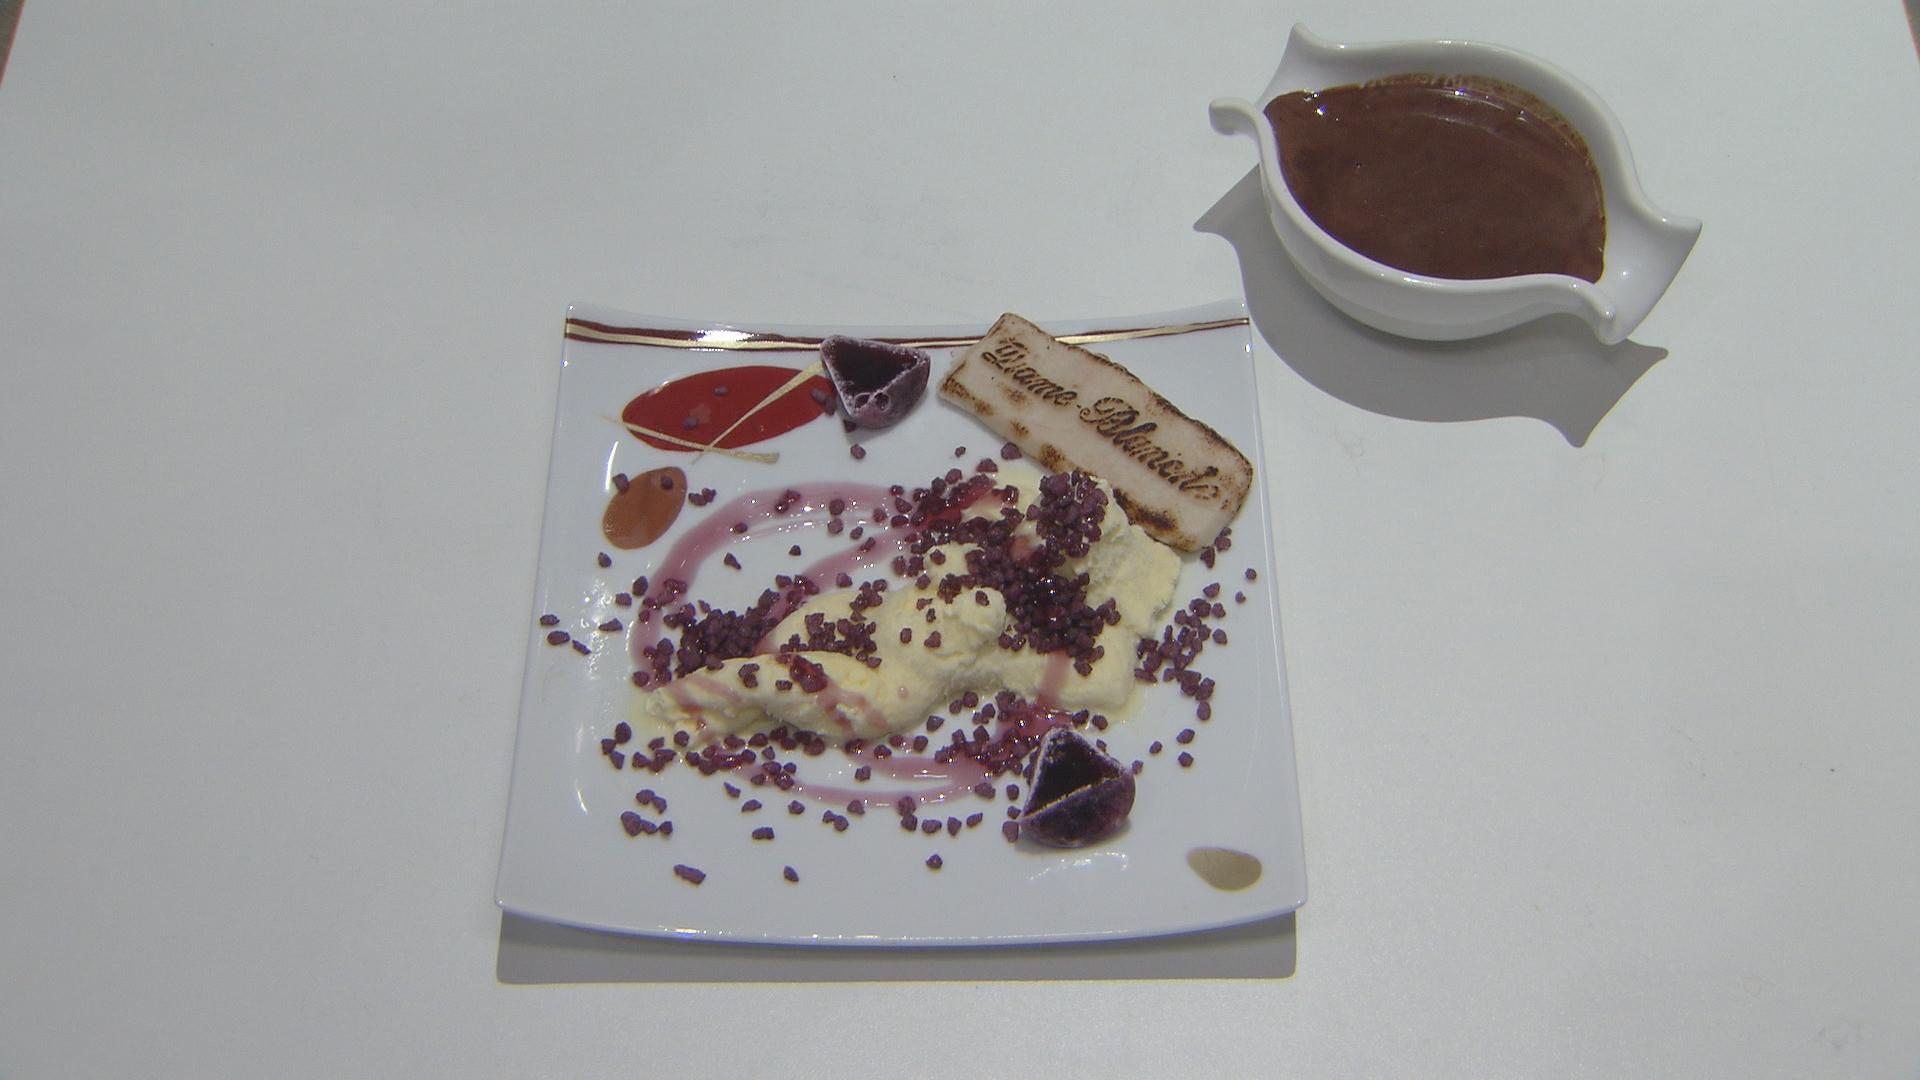 Flensje met cuberdonsaus, viooltjes, frambozen en een bolletje ijs ...